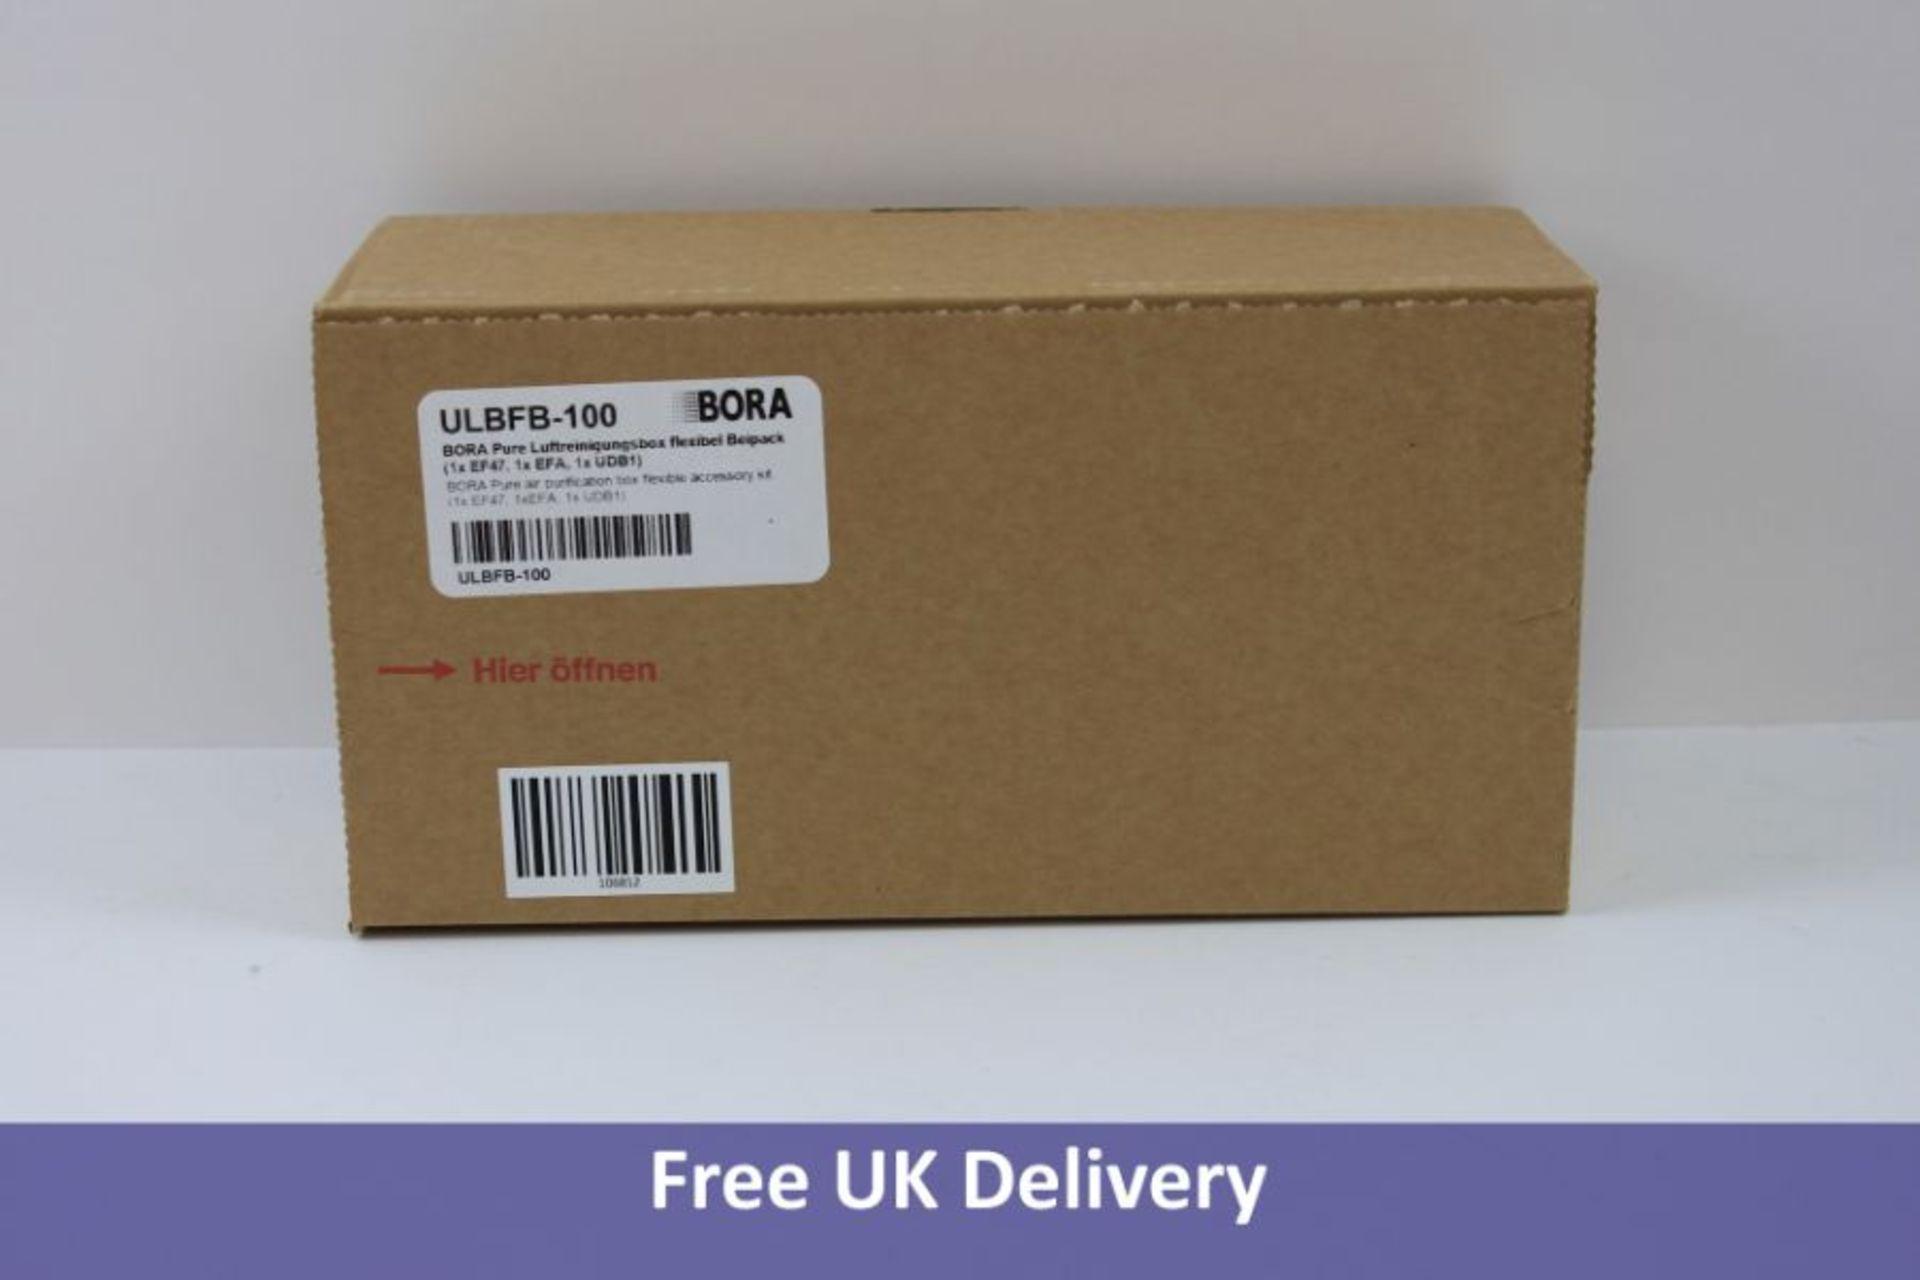 Bora Air Purification Box Flexible Accessory Kit